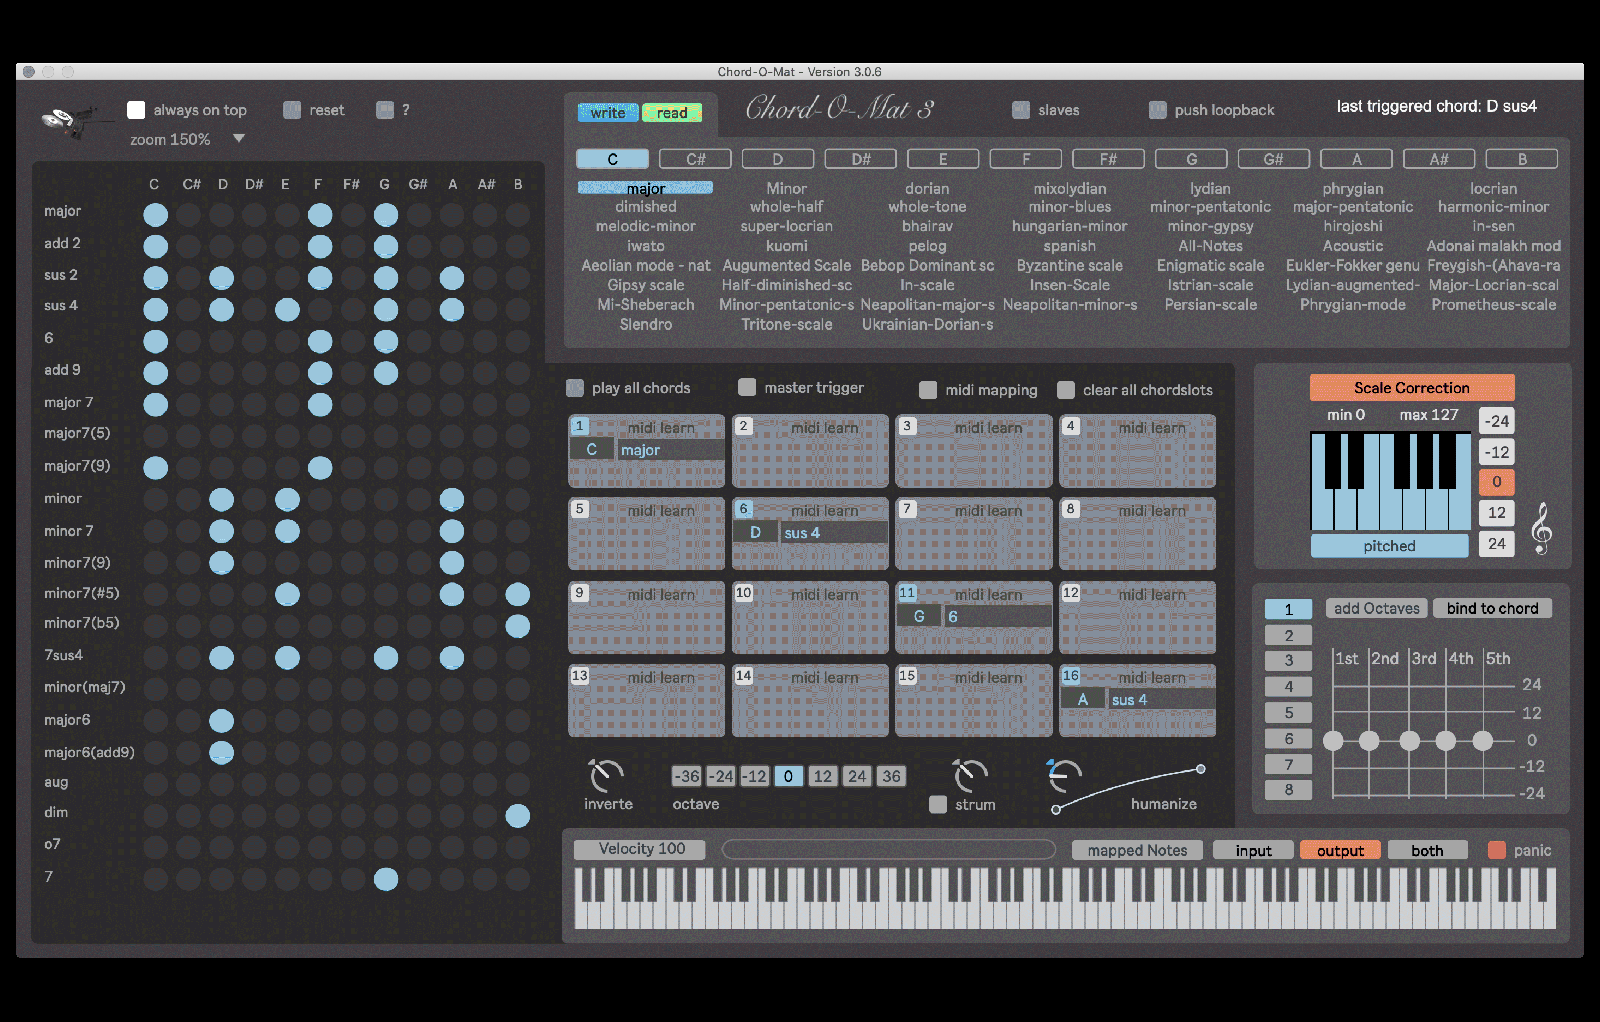 Chord-O-Mat 3